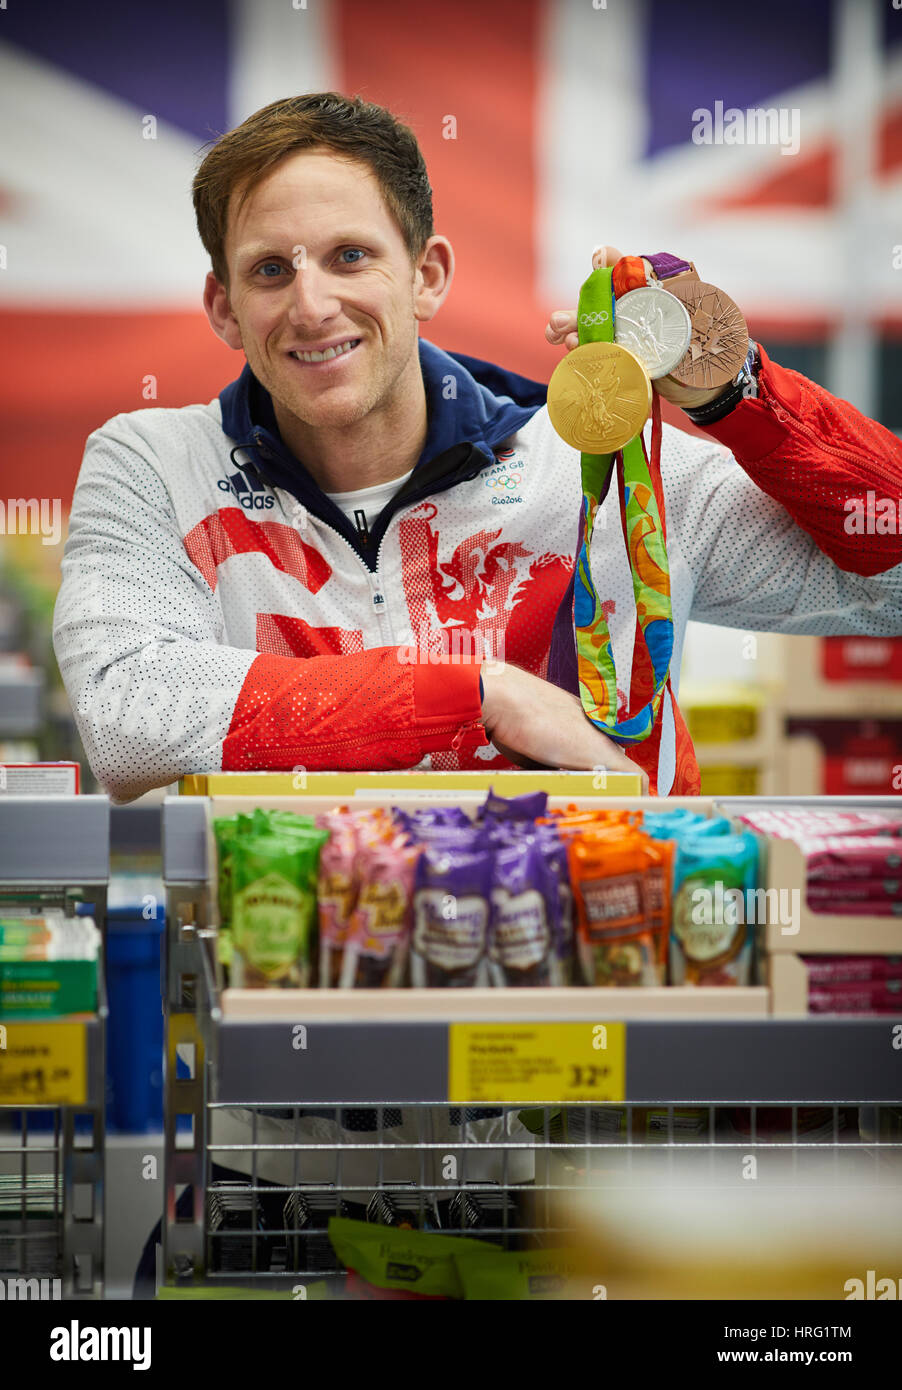 Matt Longridge with medals inside his local Aldi store in Northwich, Cheshire, England, UK. - Stock Image